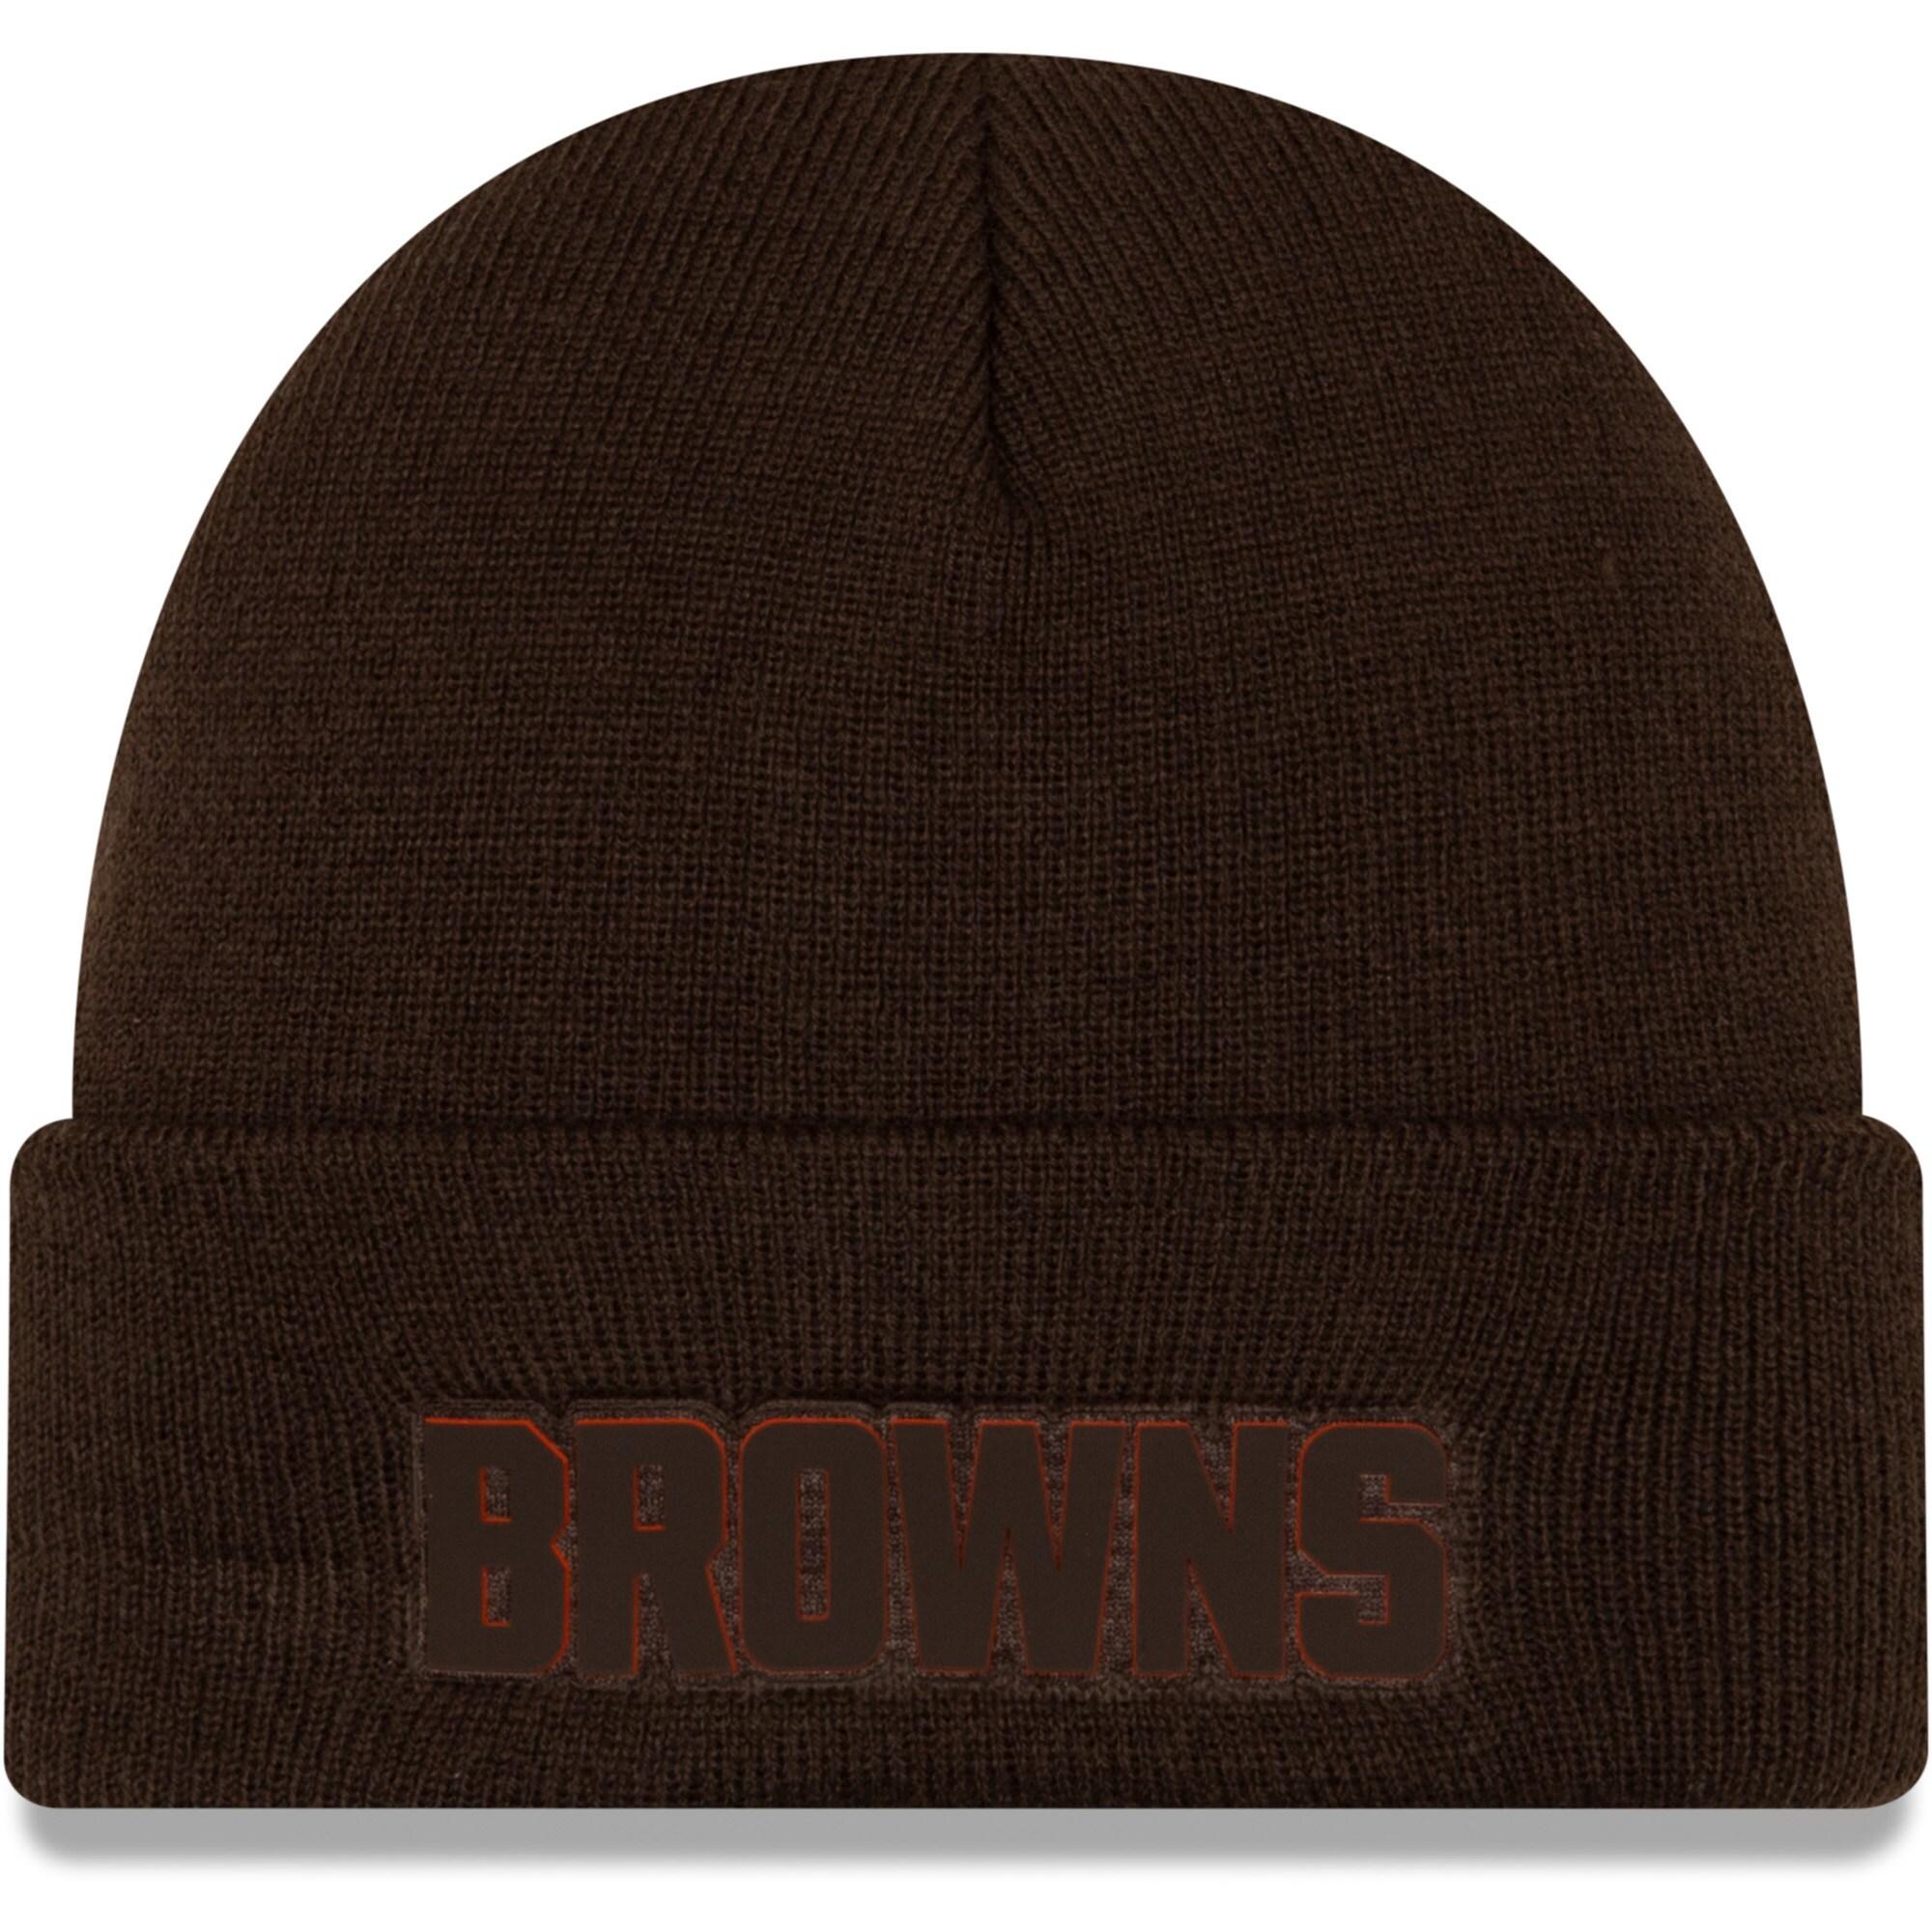 Cleveland Browns New Era Vivid Cuffed Knit Hat - Brown